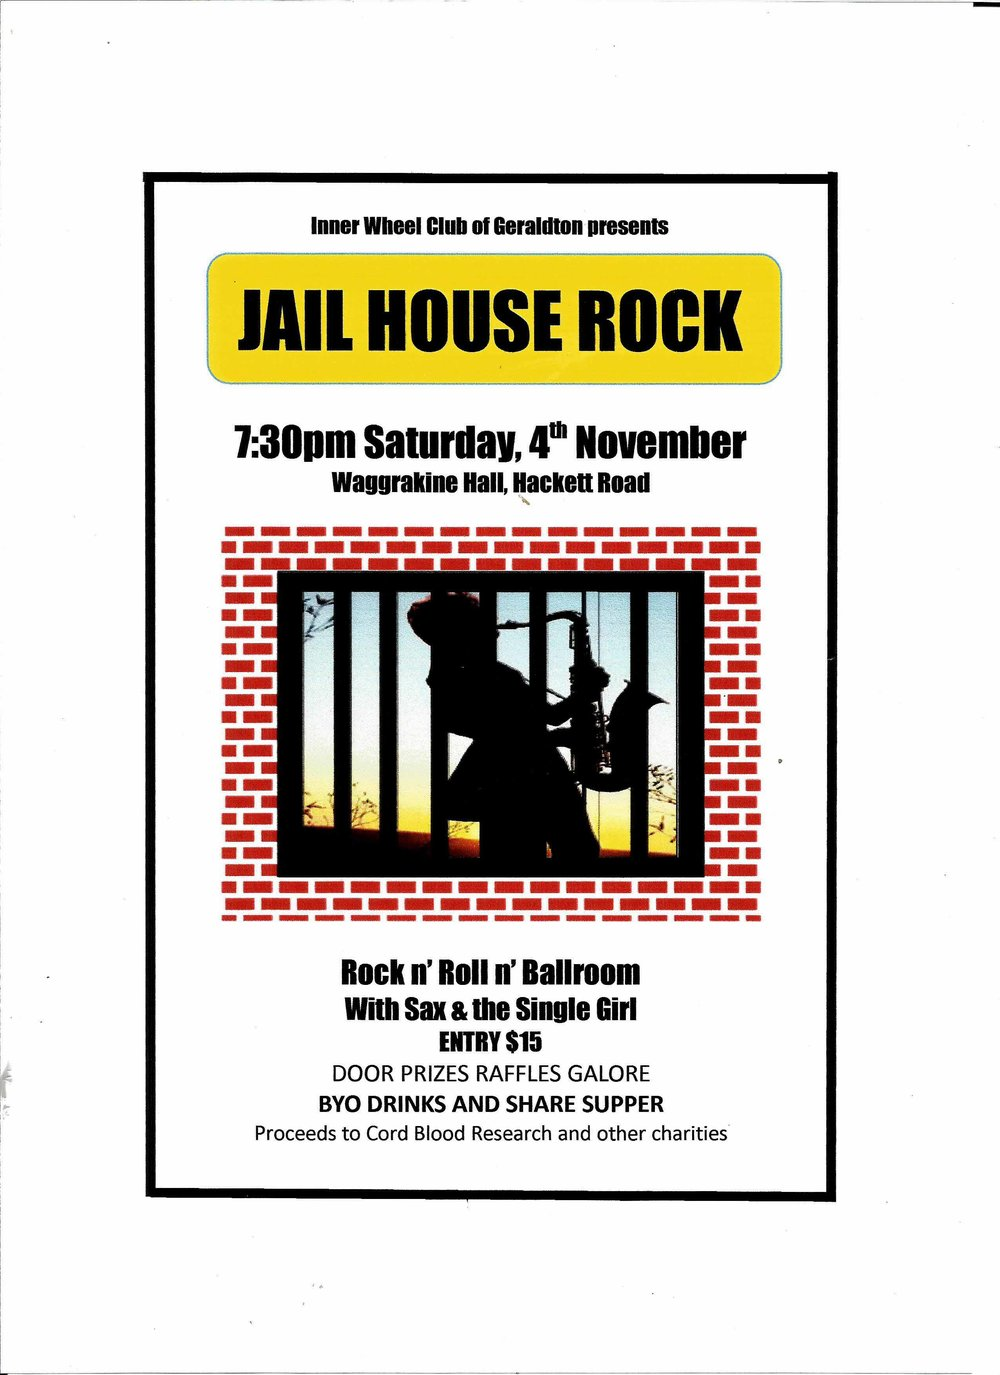 17967424_Final version Jailhouse Rock poster.jpg